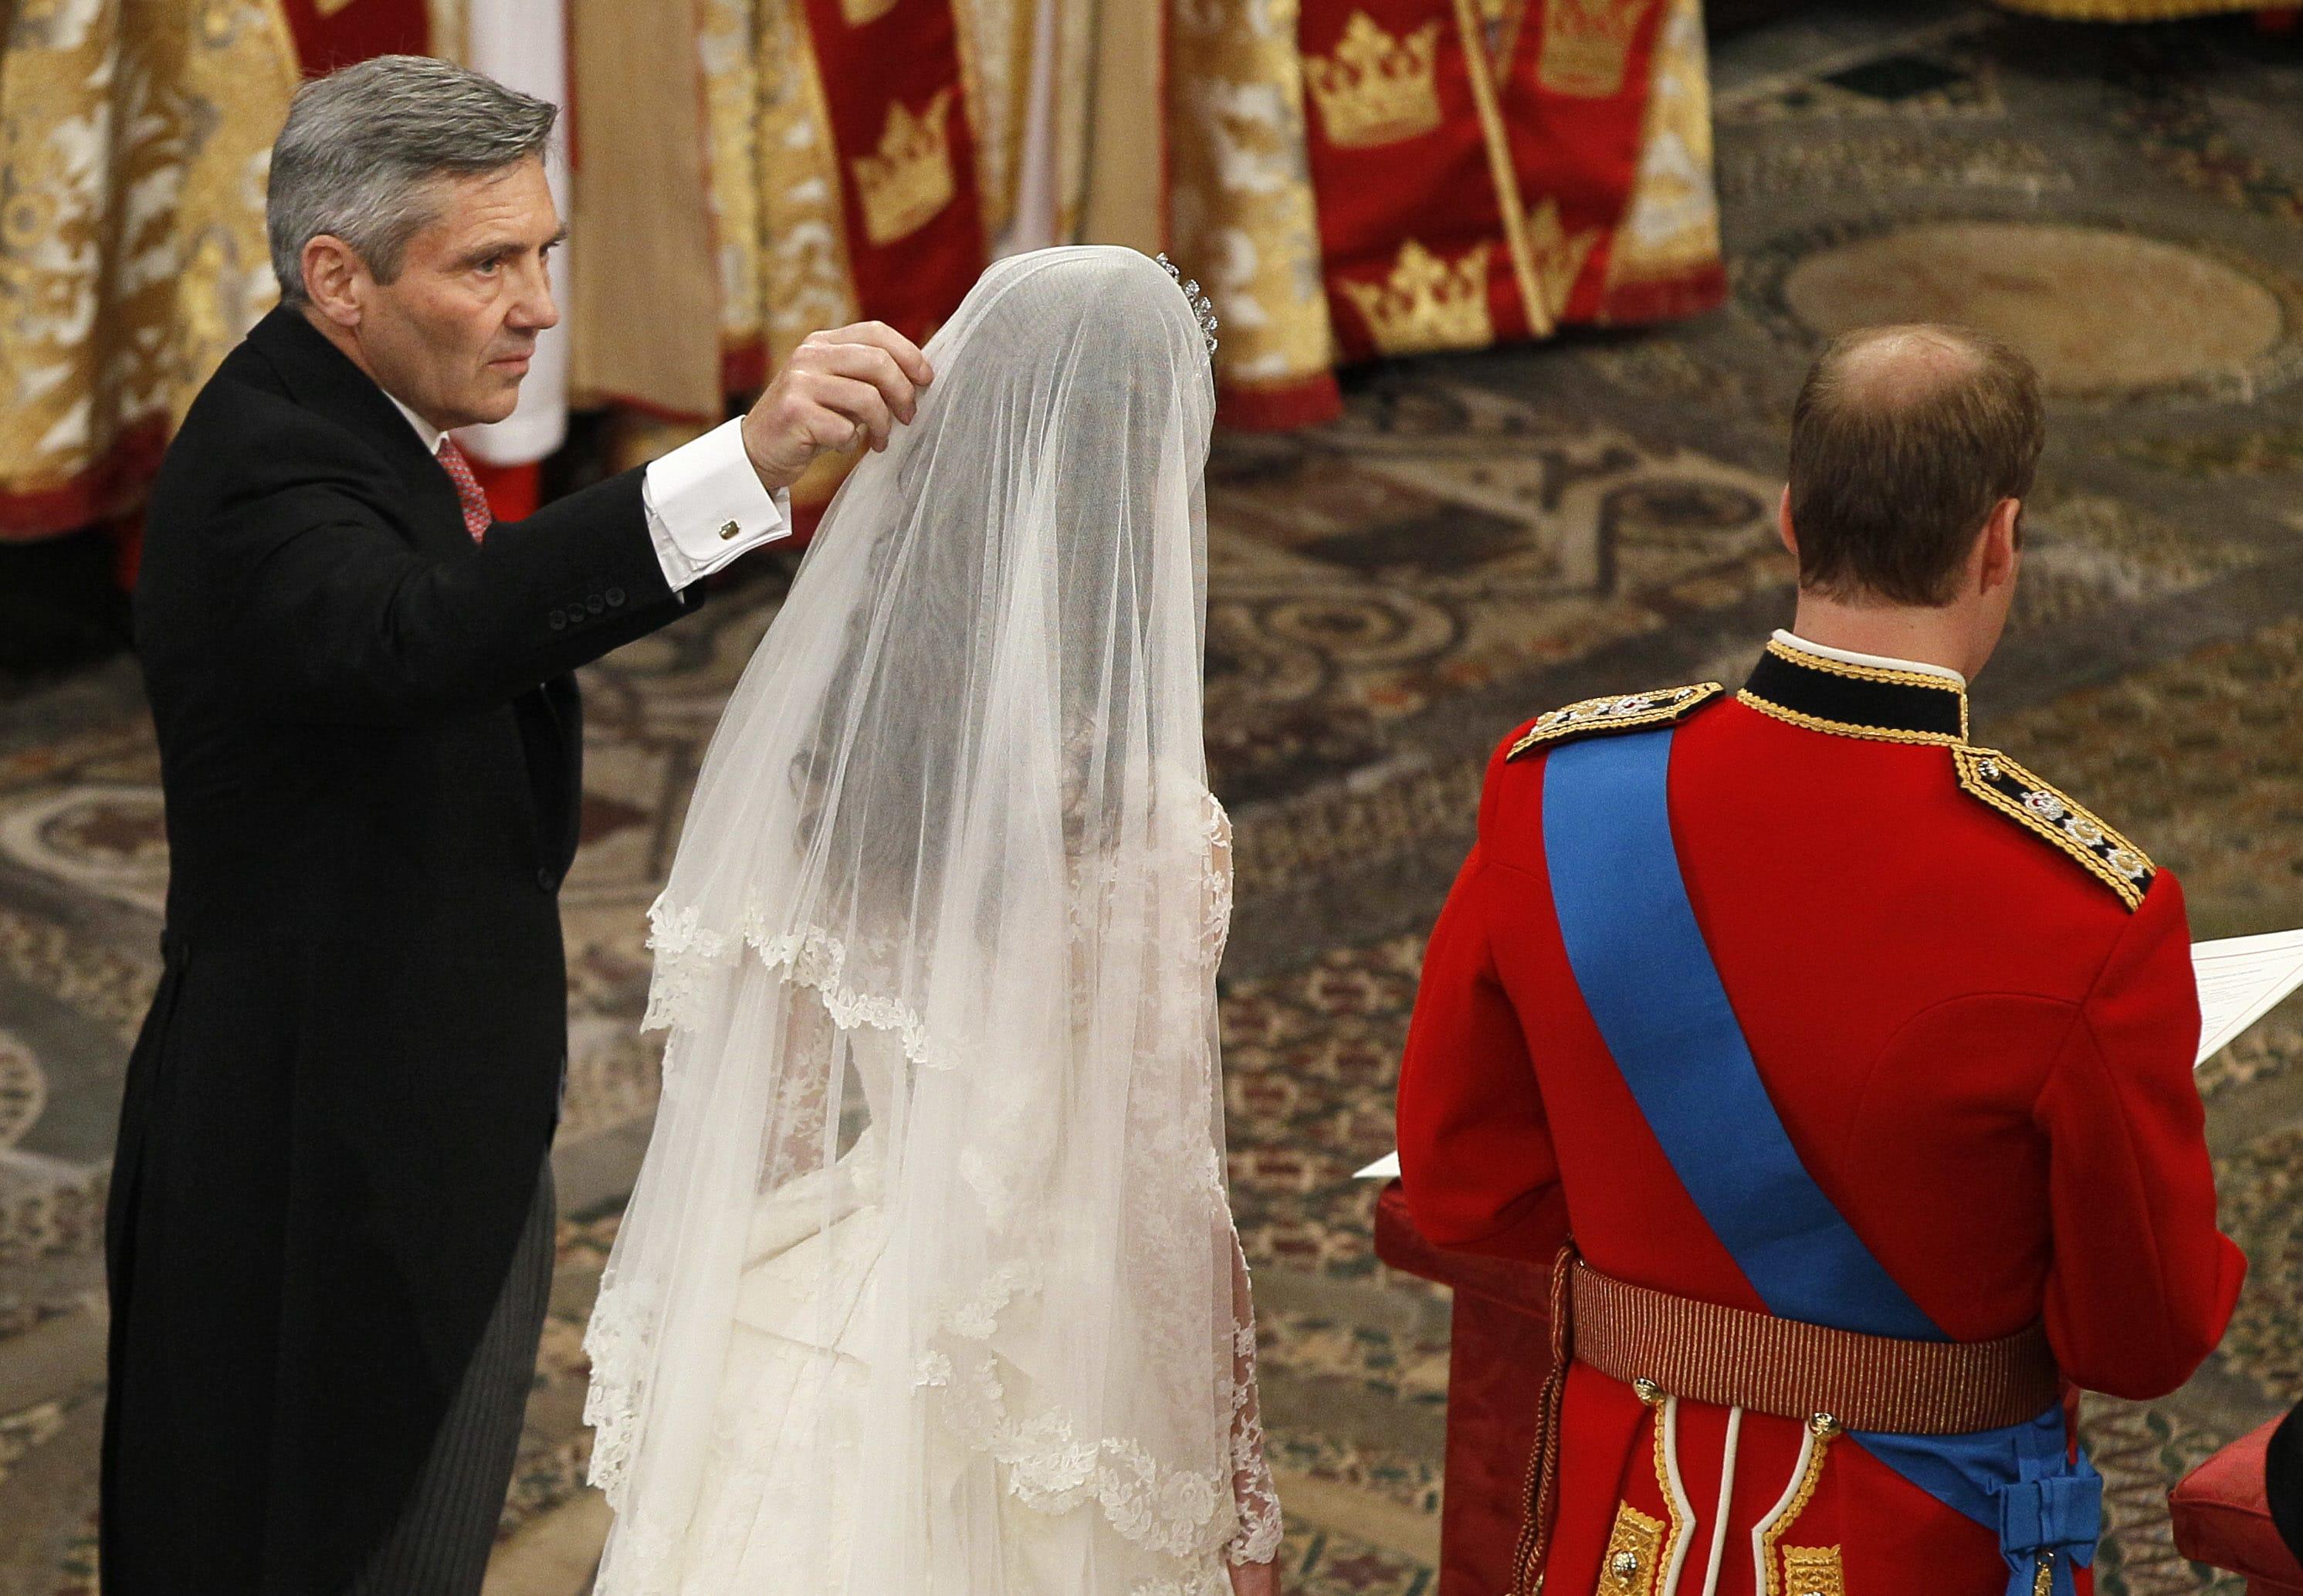 Kate Middleton Queen Elizabeth II - The Hollywood Gossip